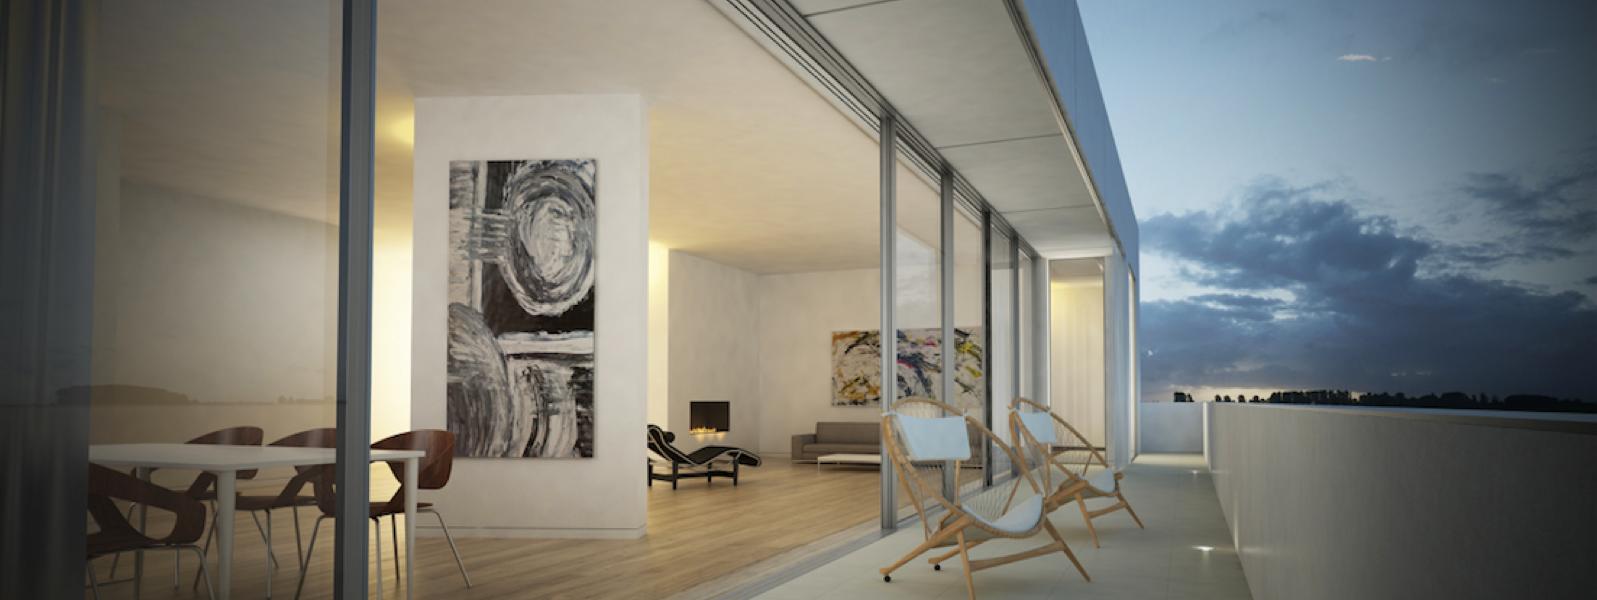 Witzlebenplatz: Beautiful apartment with fireplace and sauna